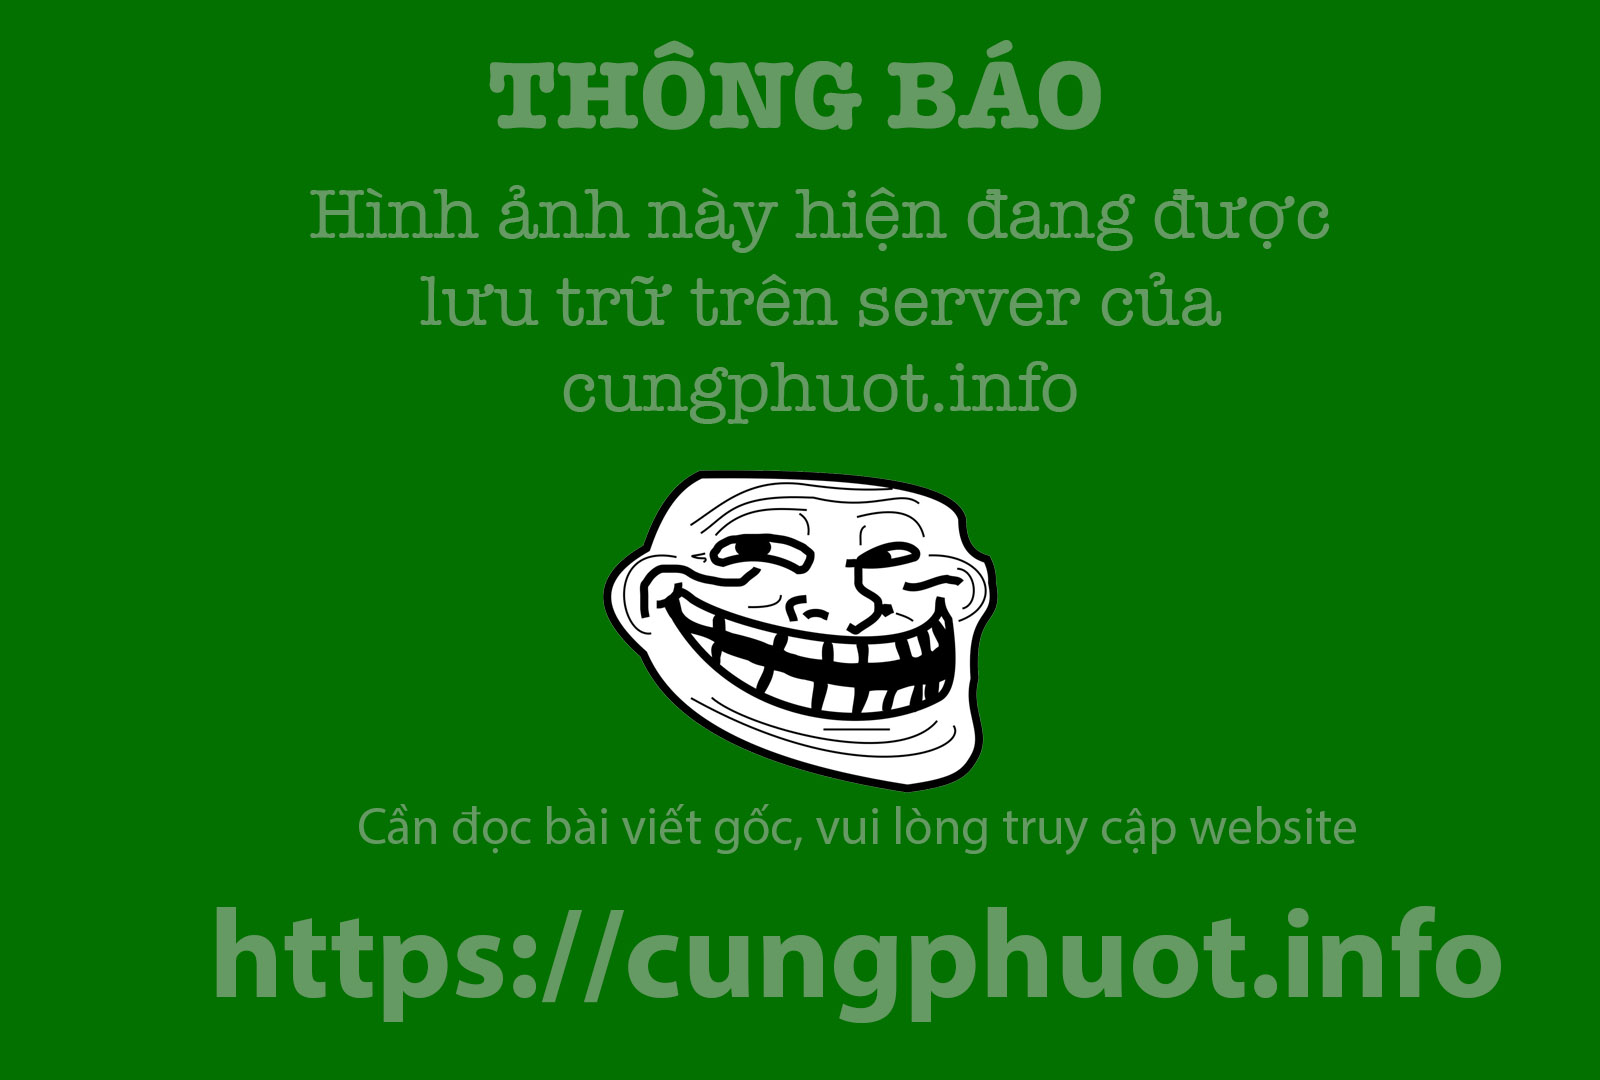 Co do Hue dep la trong suong mu hinh anh 9